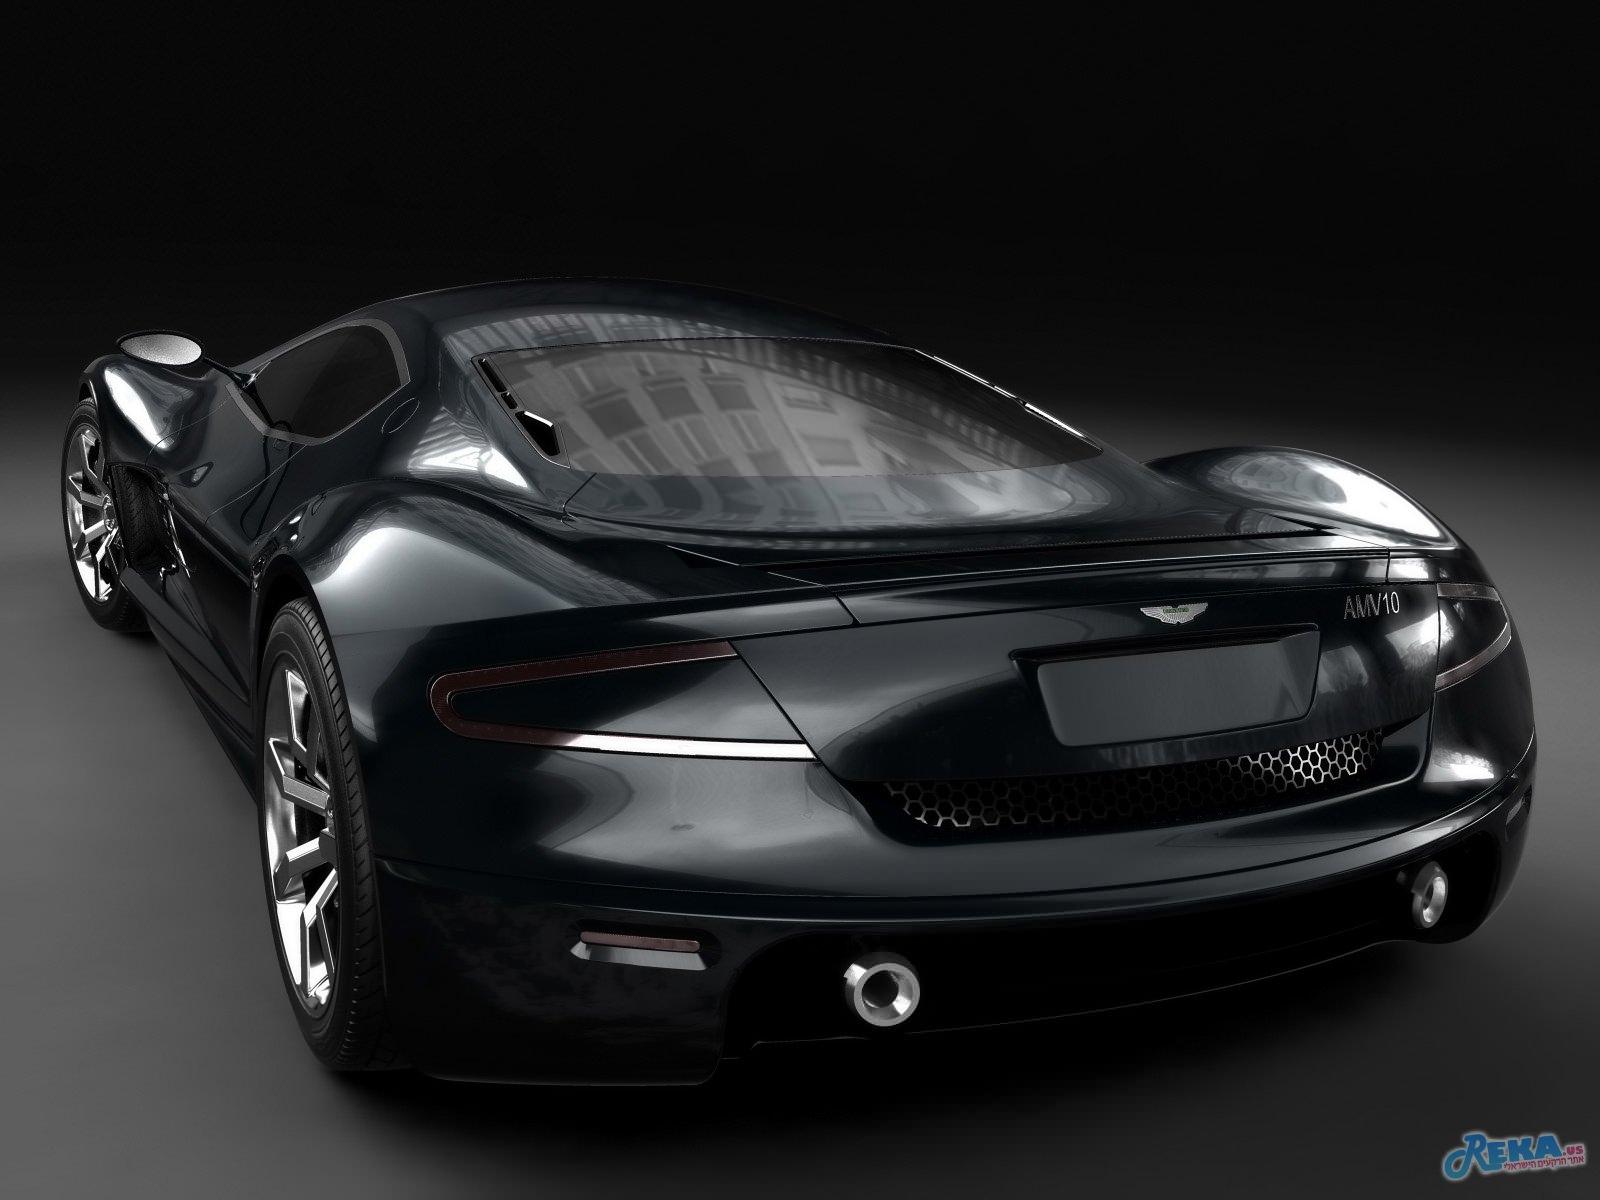 Sabino_Design_Aston_Martin_AMV10_01.jpg